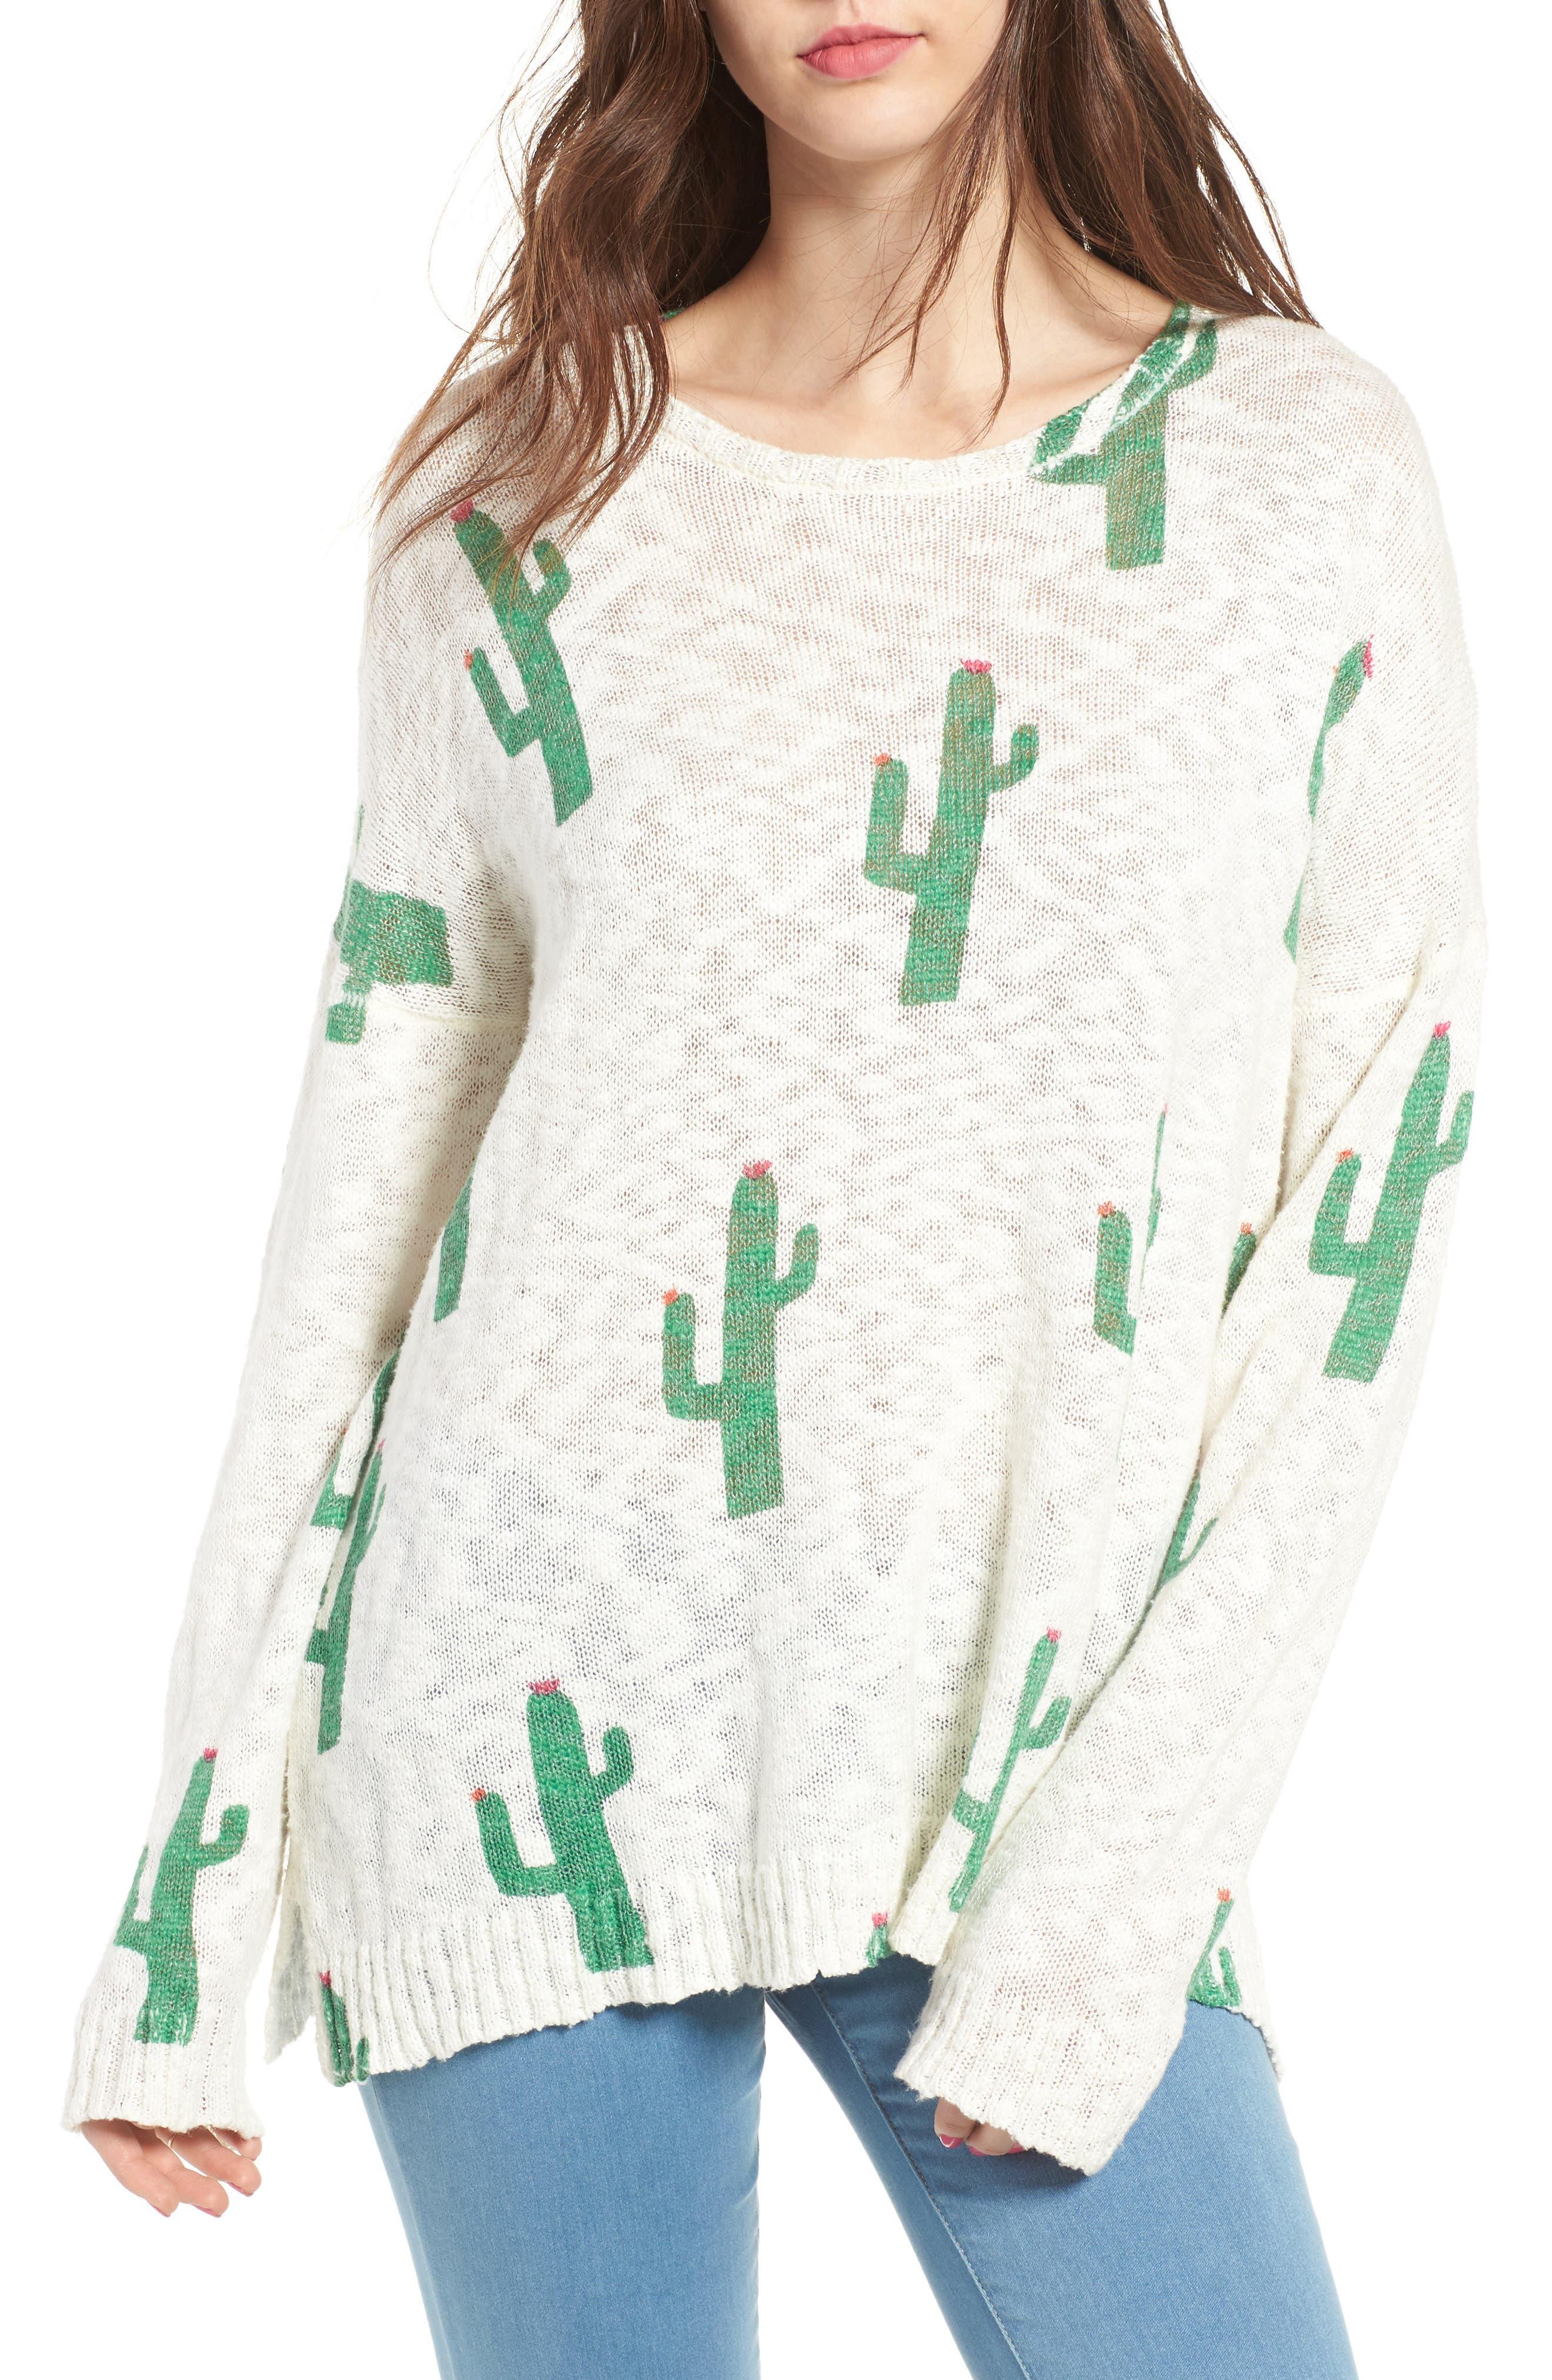 Main Image - Show Me Your Mumu Varsity Pullover